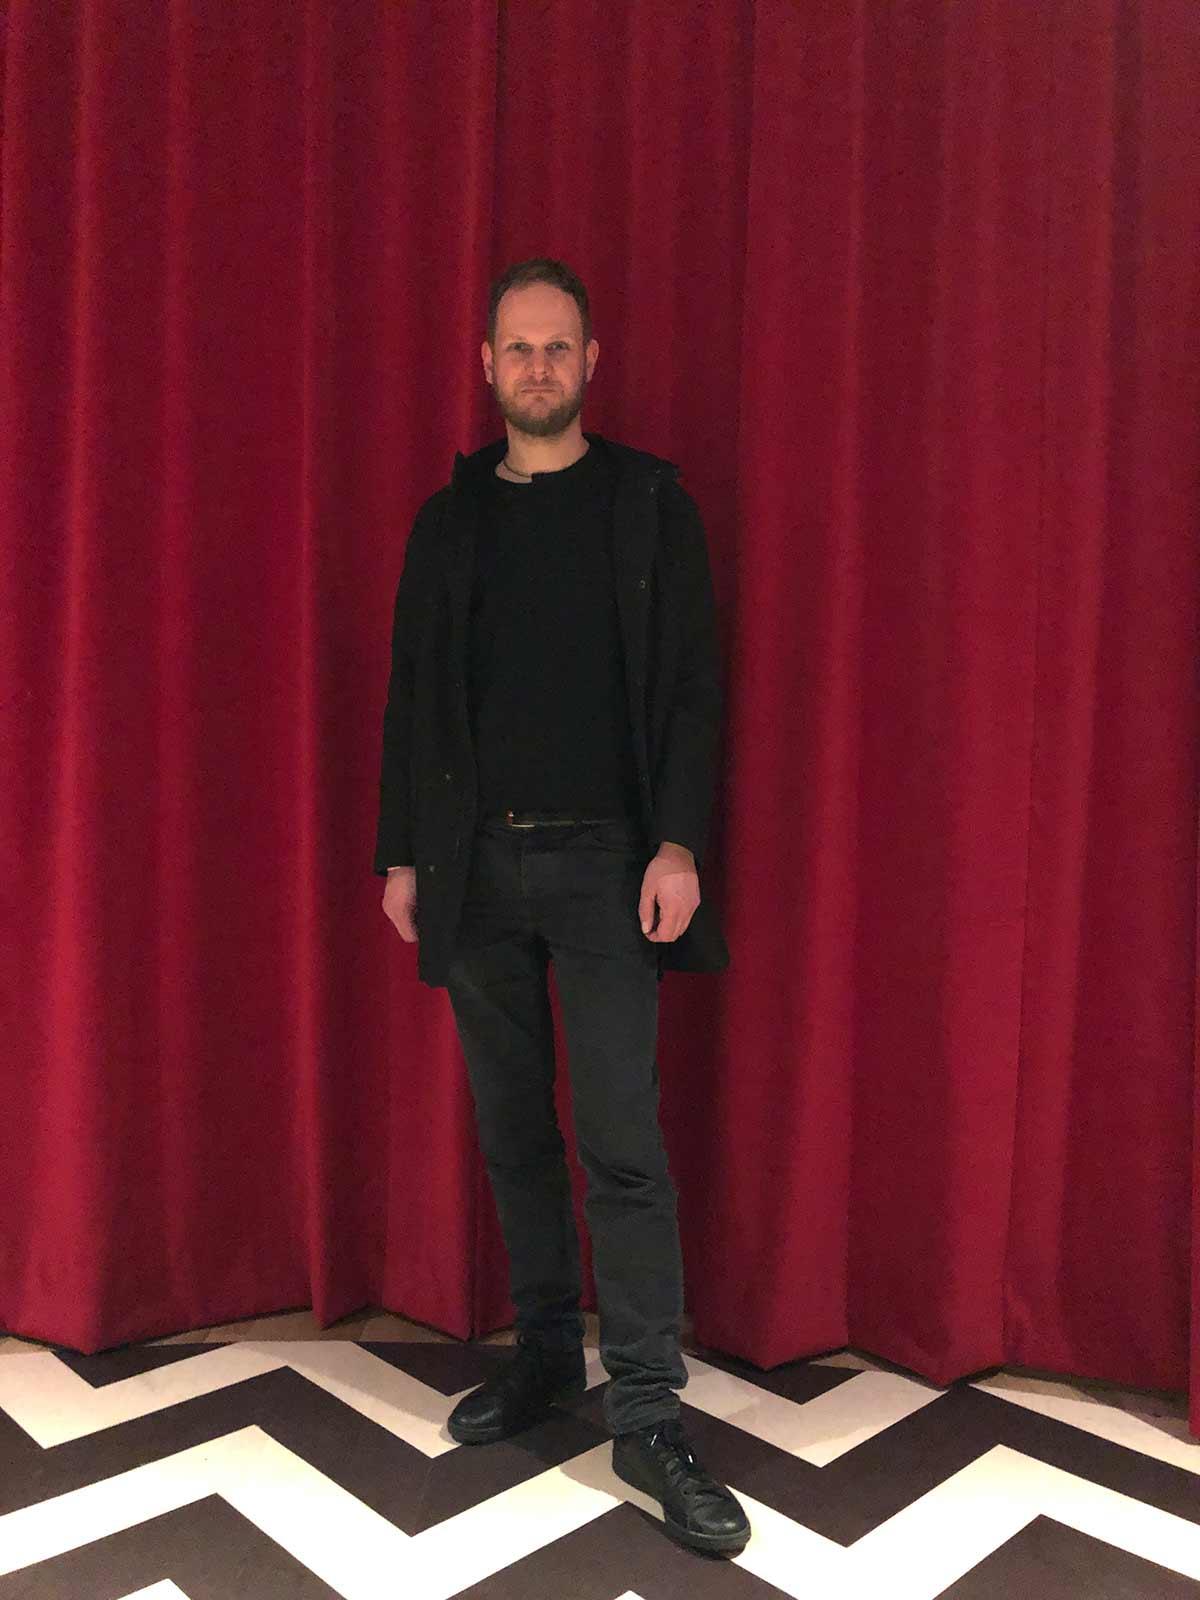 maurice funken, artist director, neuer aachener kunstverein, leiter, nak, art people, portrait